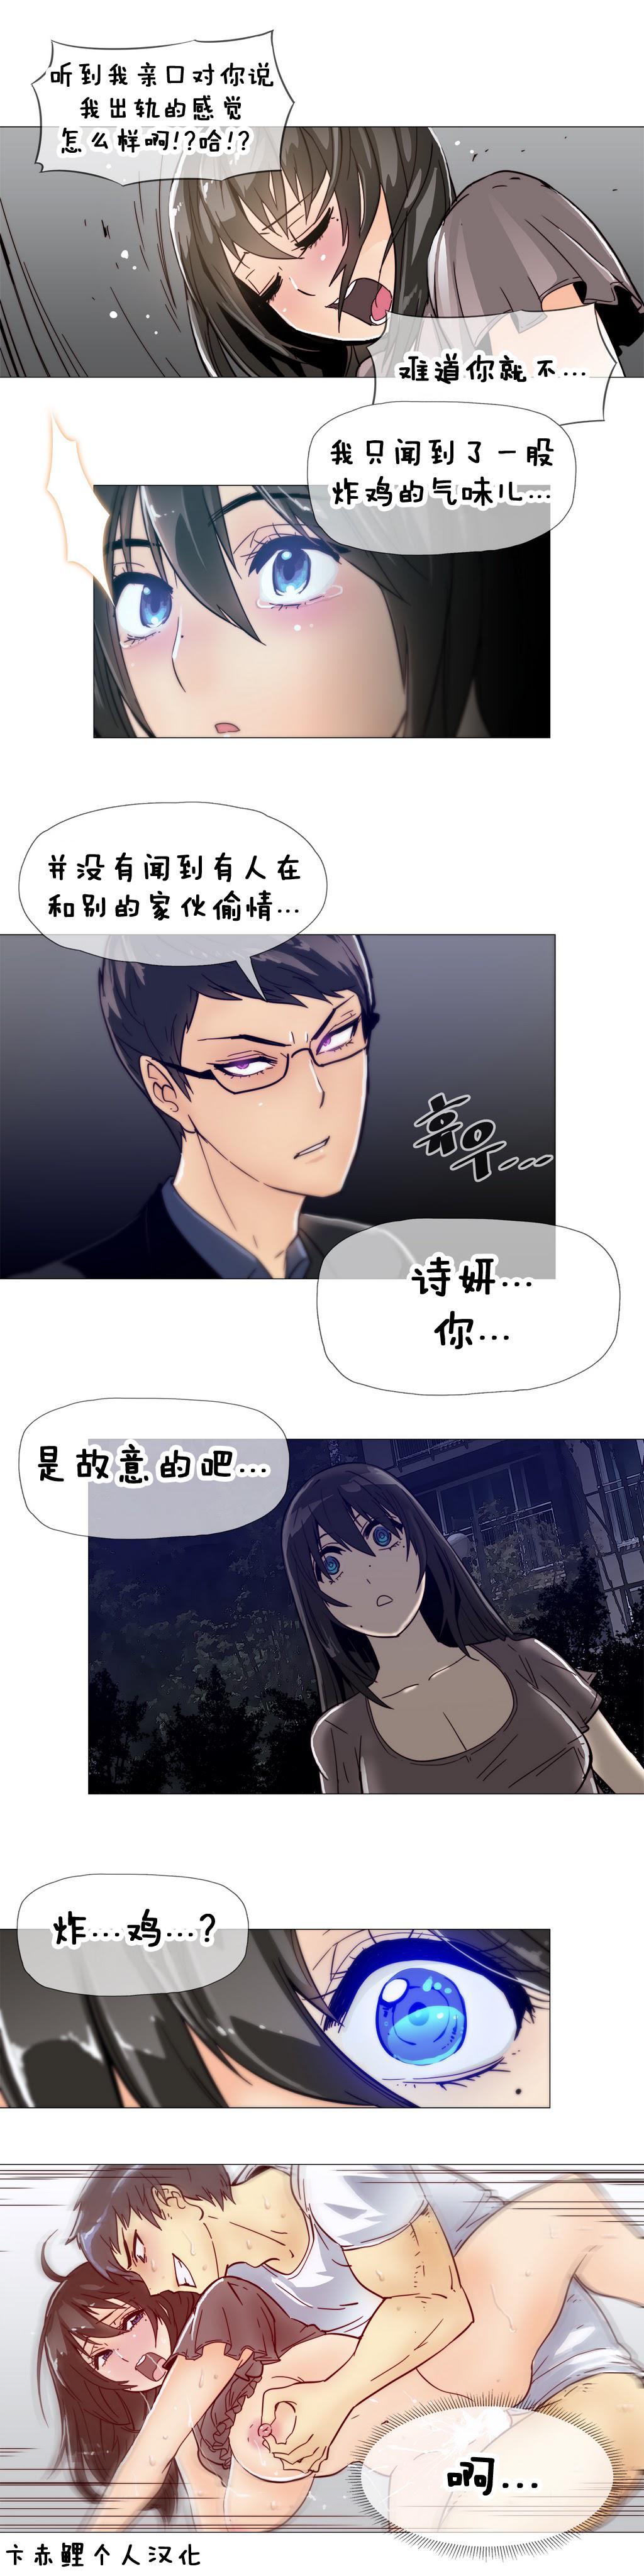 HouseHold Affairs 【卞赤鲤个人汉化】1~21话(持续更新中) 225